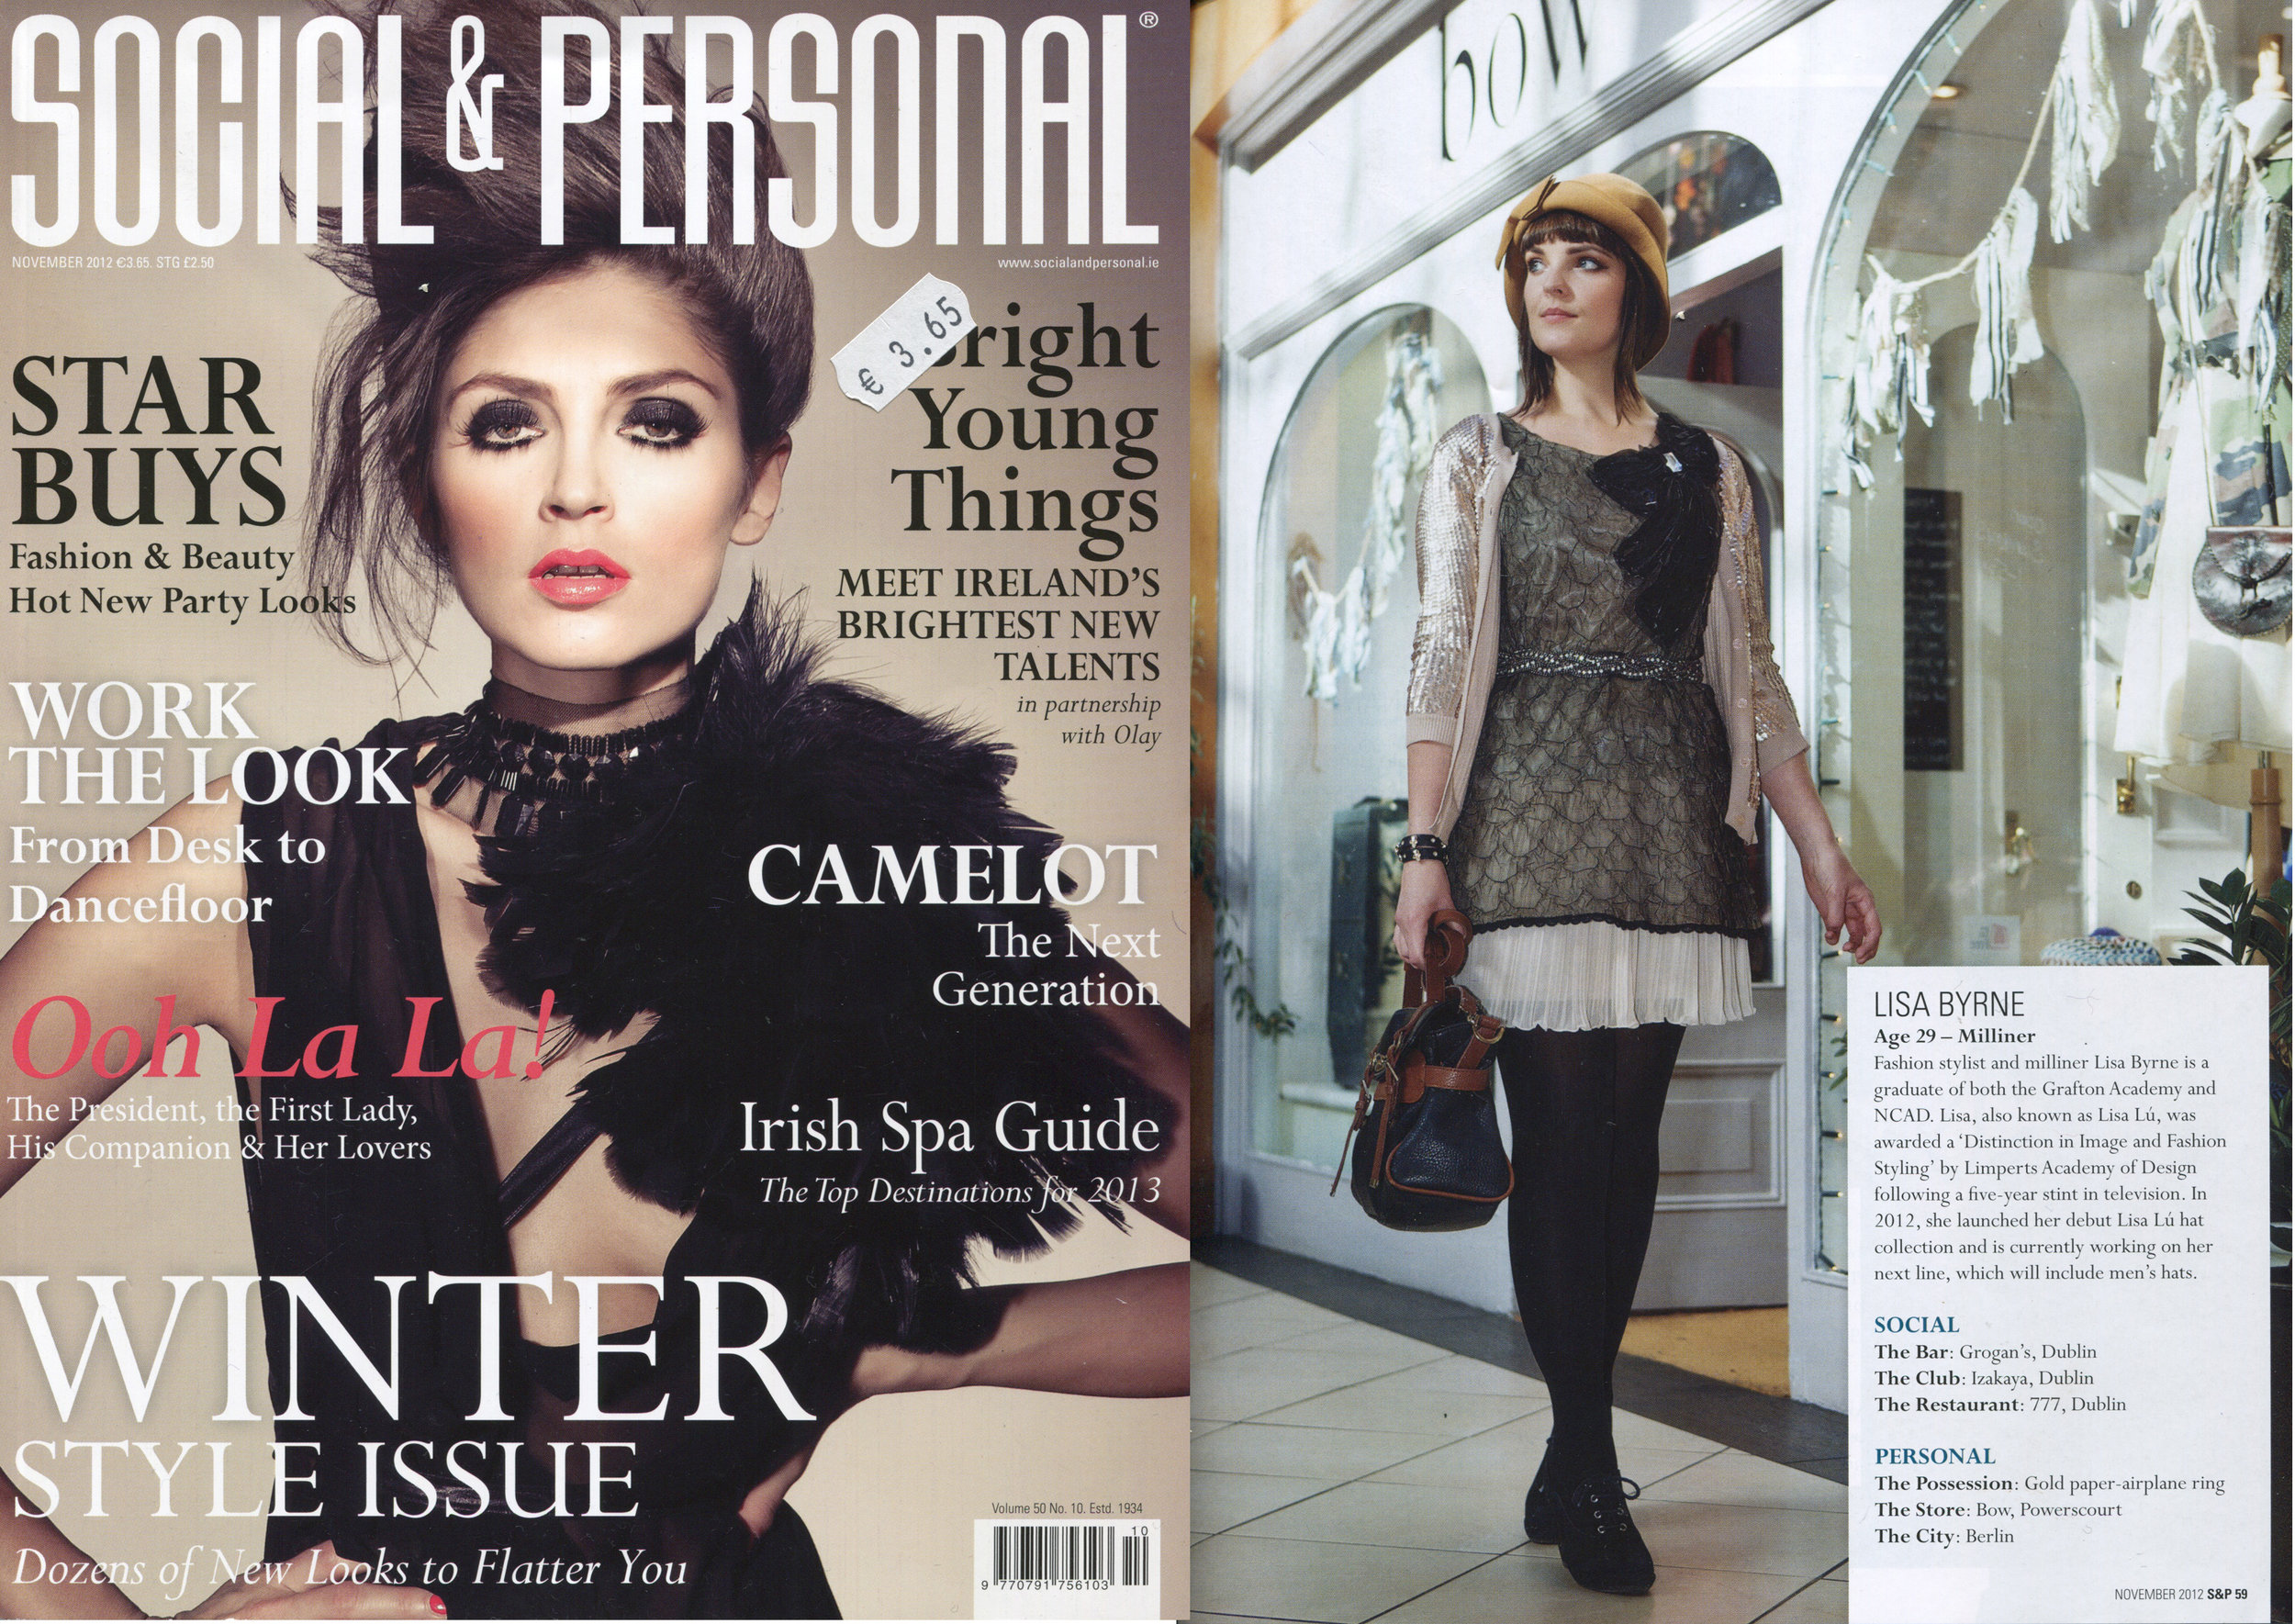 Social&Personal_November12_Press.jpg